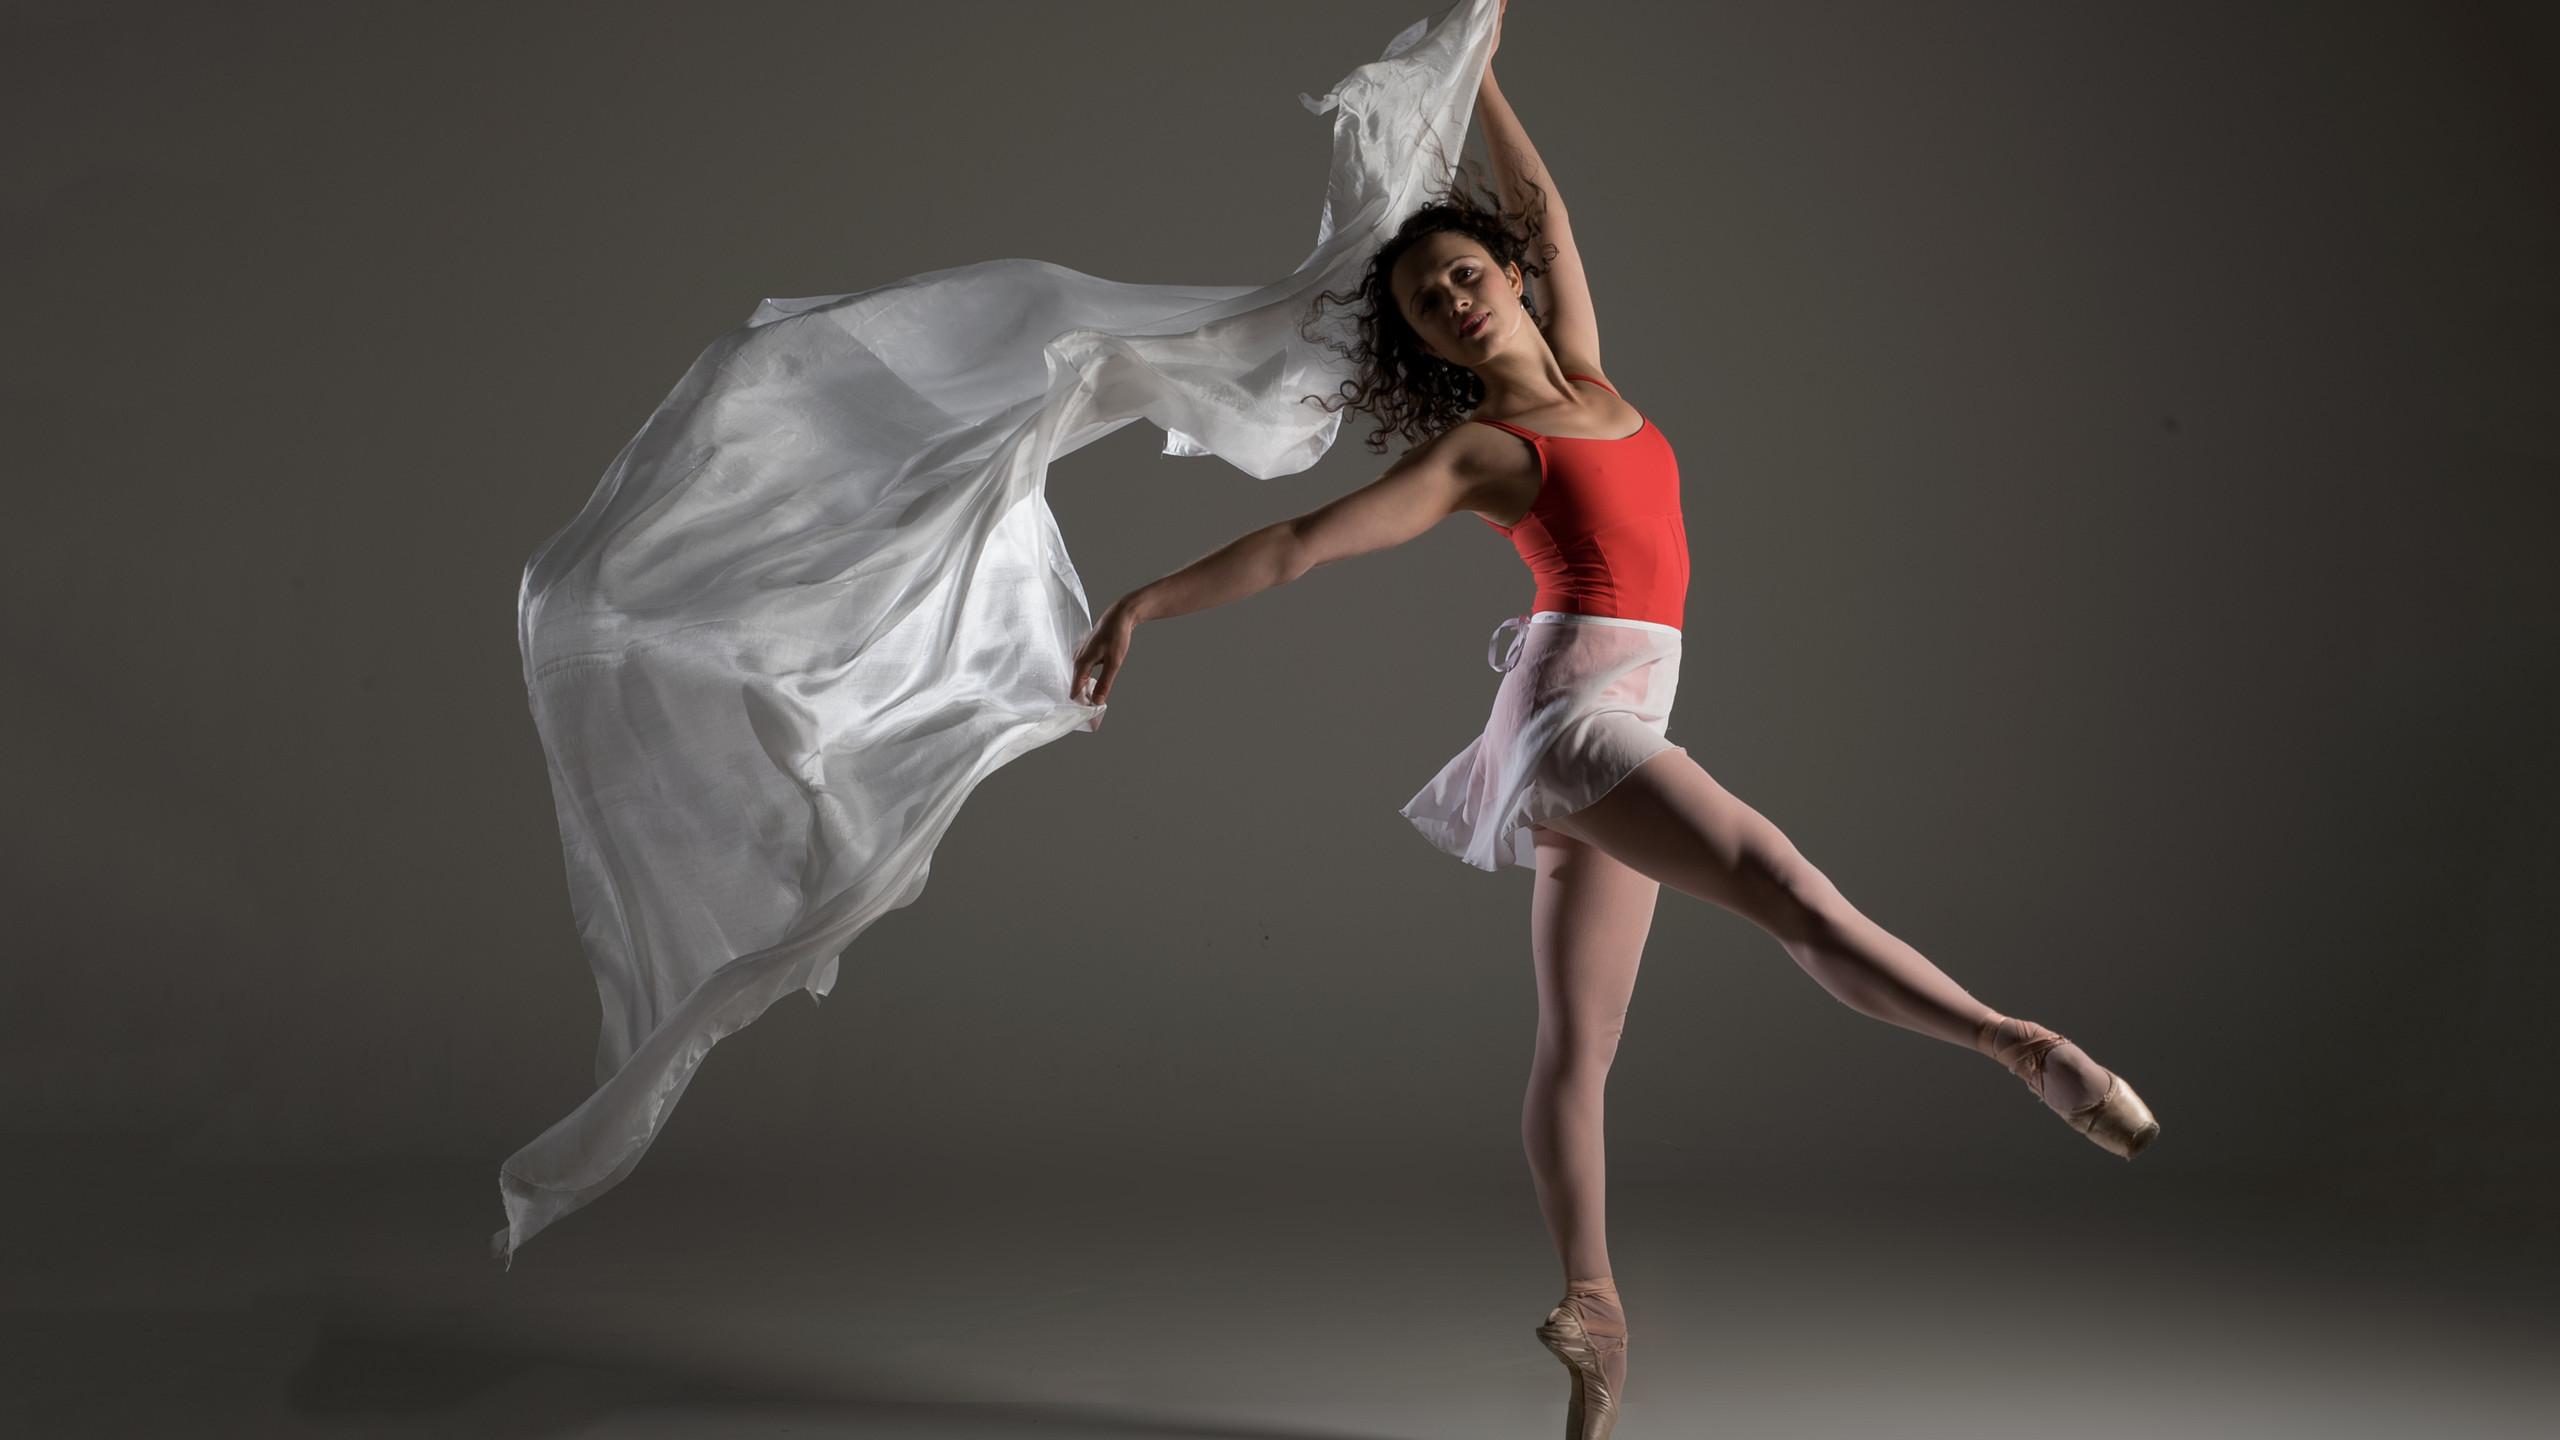 White dance silk